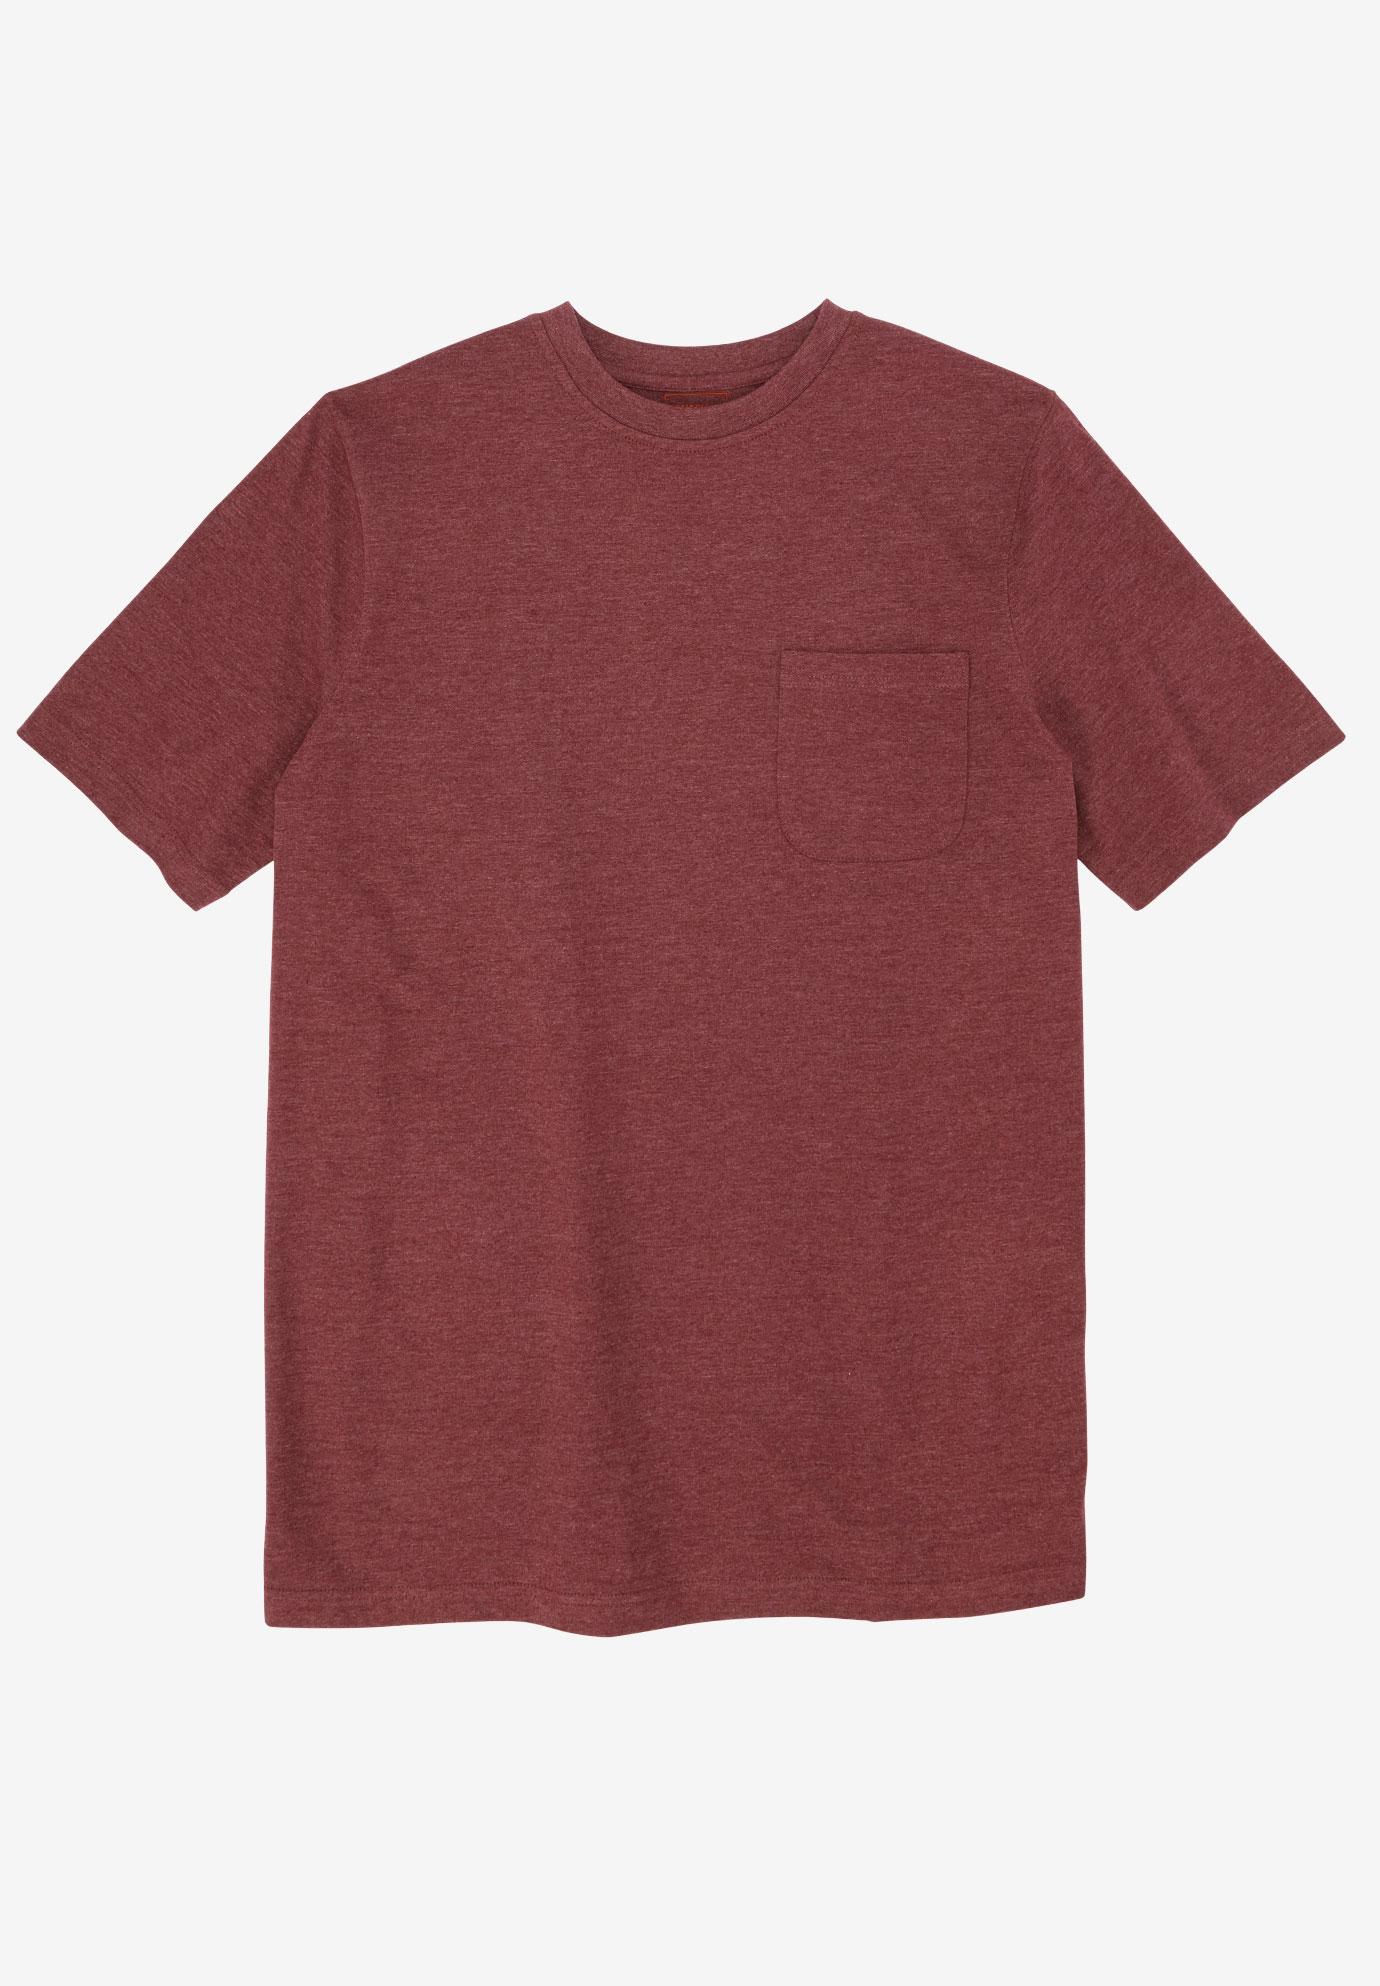 Boulder Creek by Kingsize Mens Big /& Tall Heavyweight Longer-Length Pocket Crewneck T-Shirt